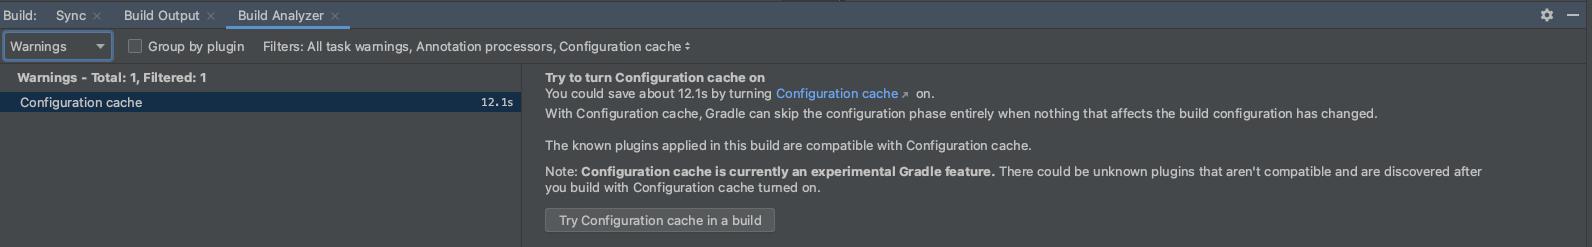 Configuration cache information in Build Analyzer